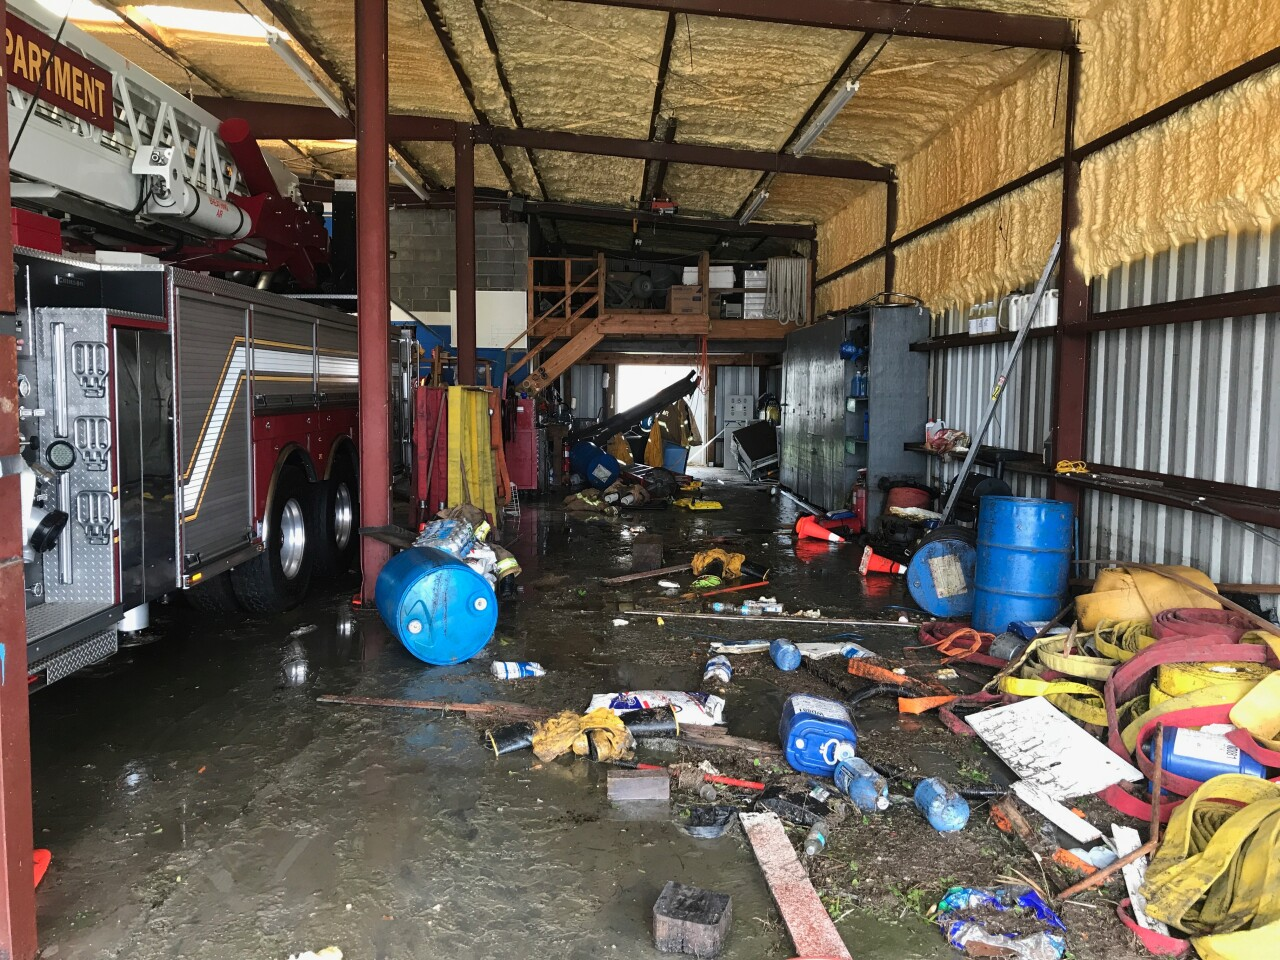 Port Aransas fire station after Hurricane Harvey